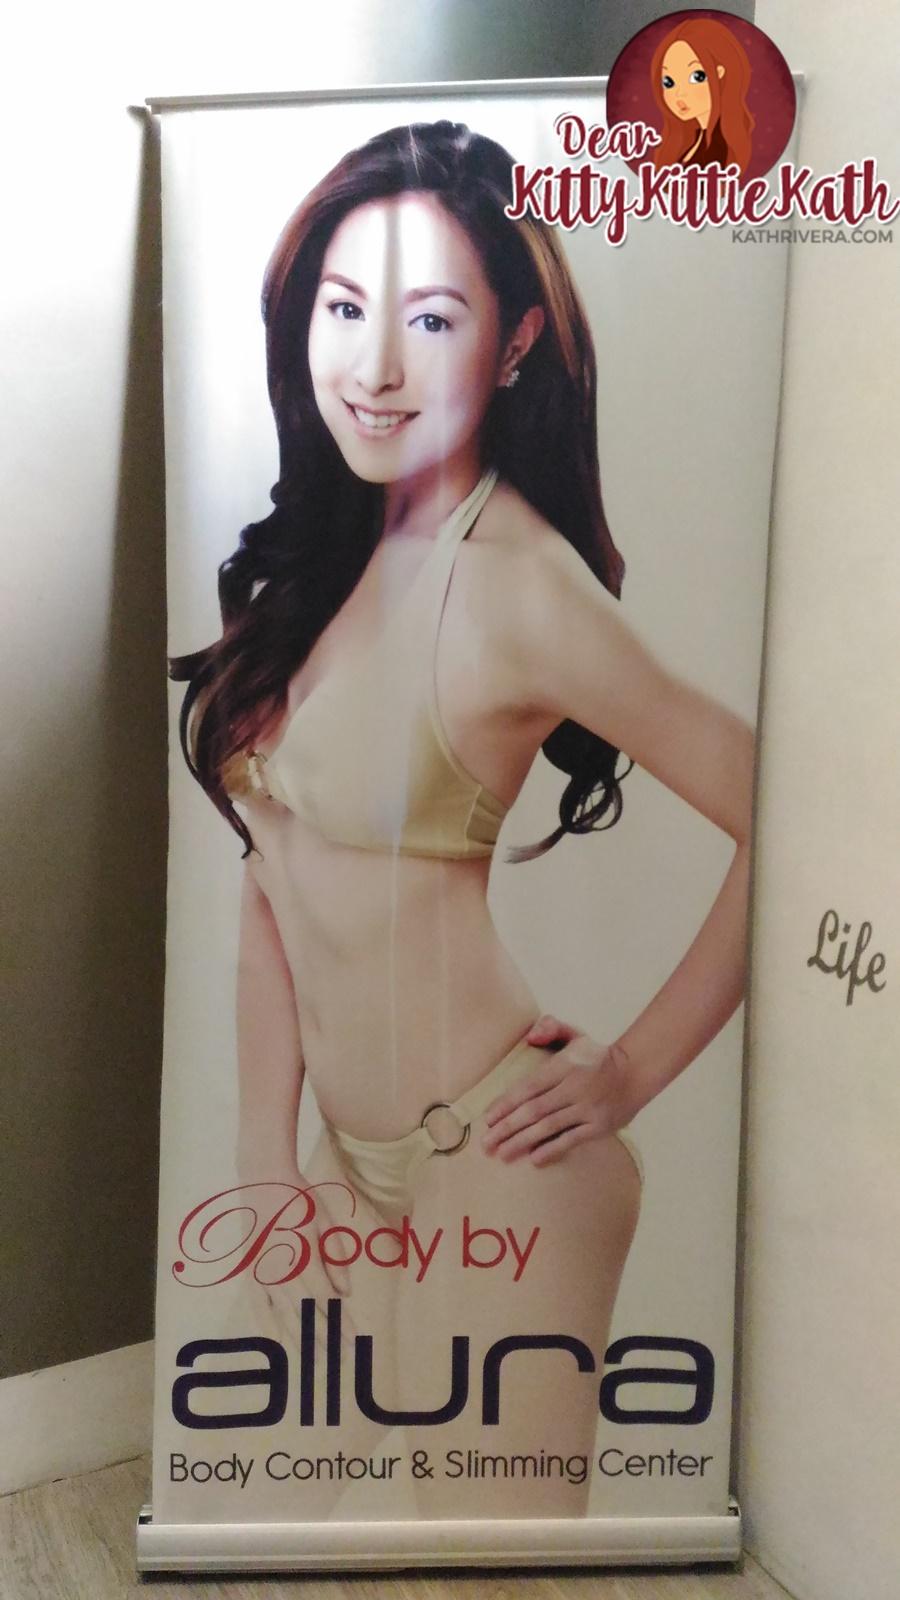 Ara Mina Naked Body allura body contour launch | dear kitty kittie kath- top